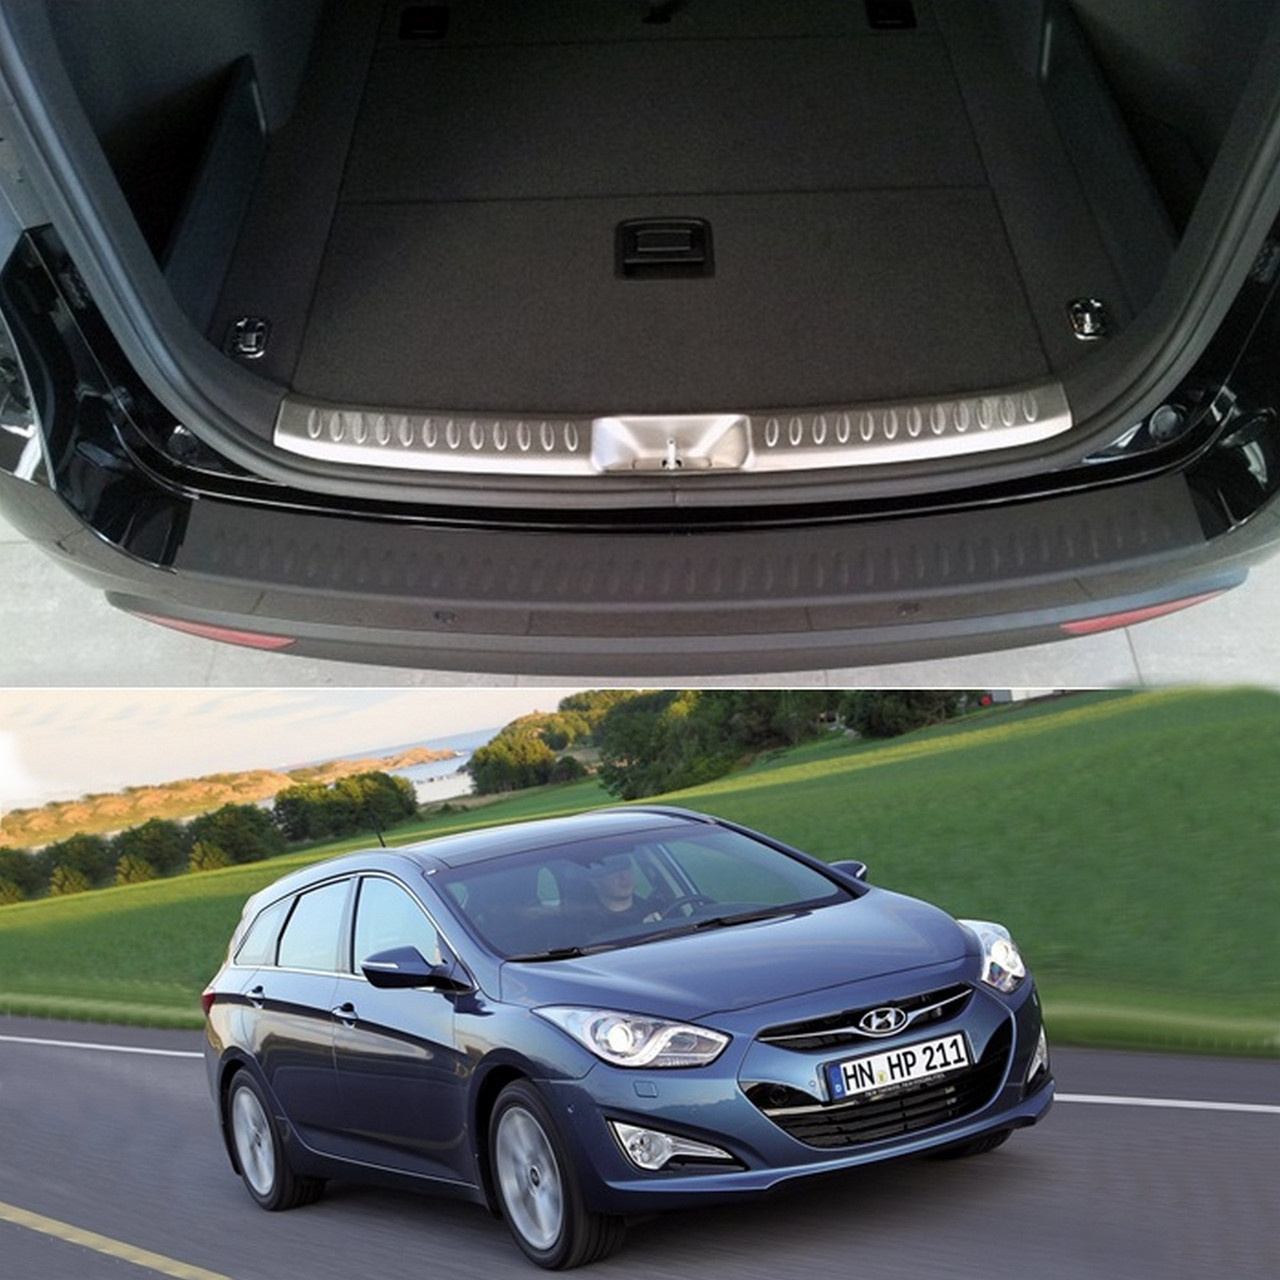 Hyundai i40 CW 2010-2015 пластиковая накладка заднего бампера